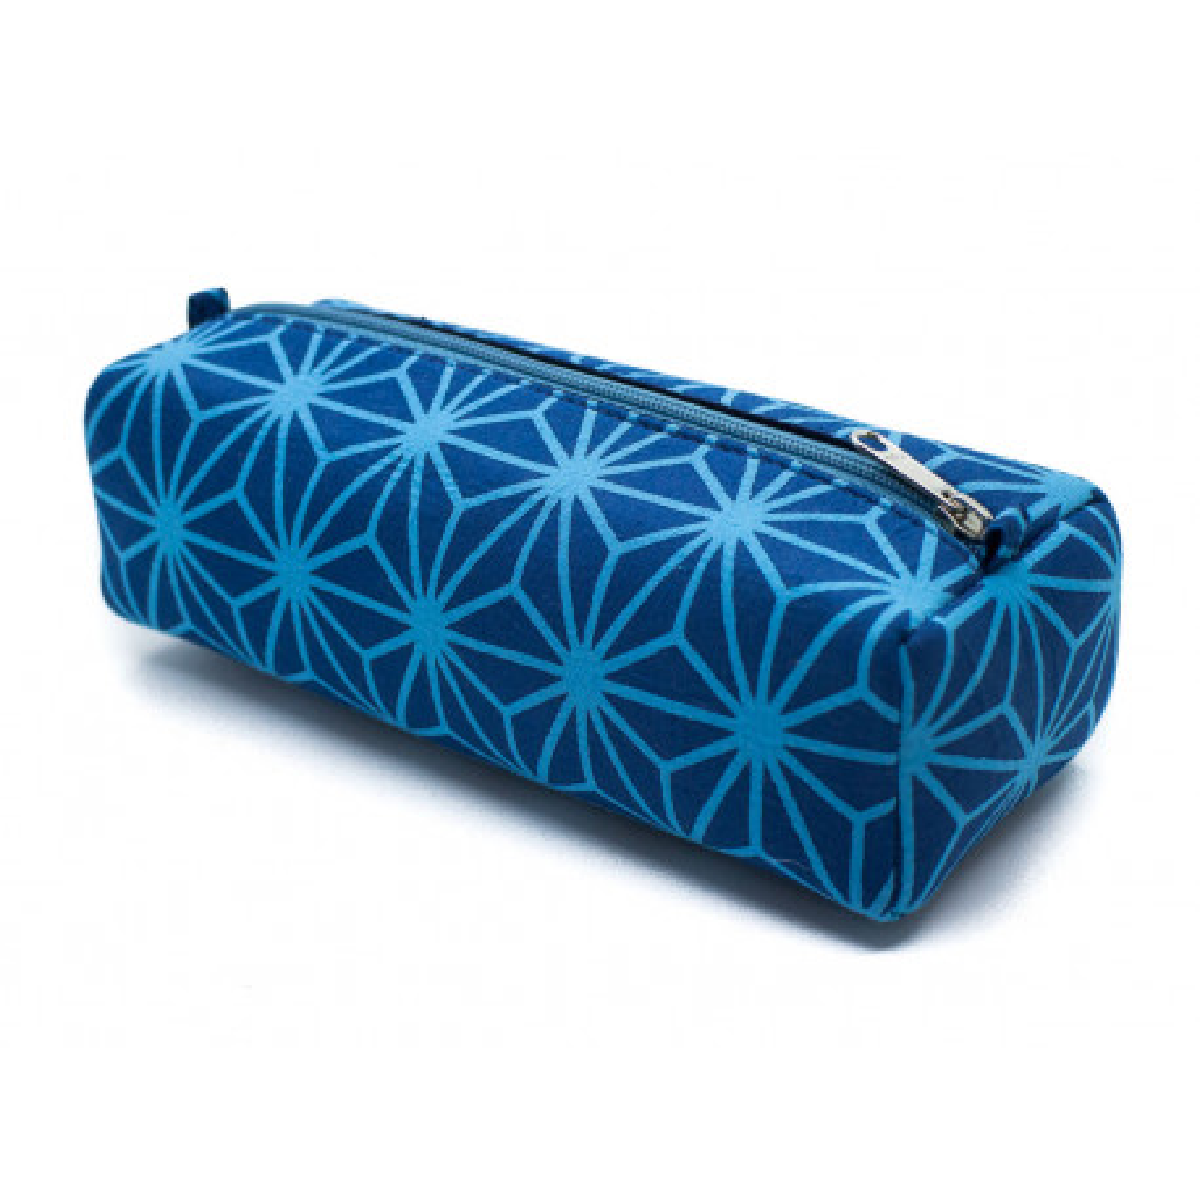 Trousse plumier coton original bleu asanoha